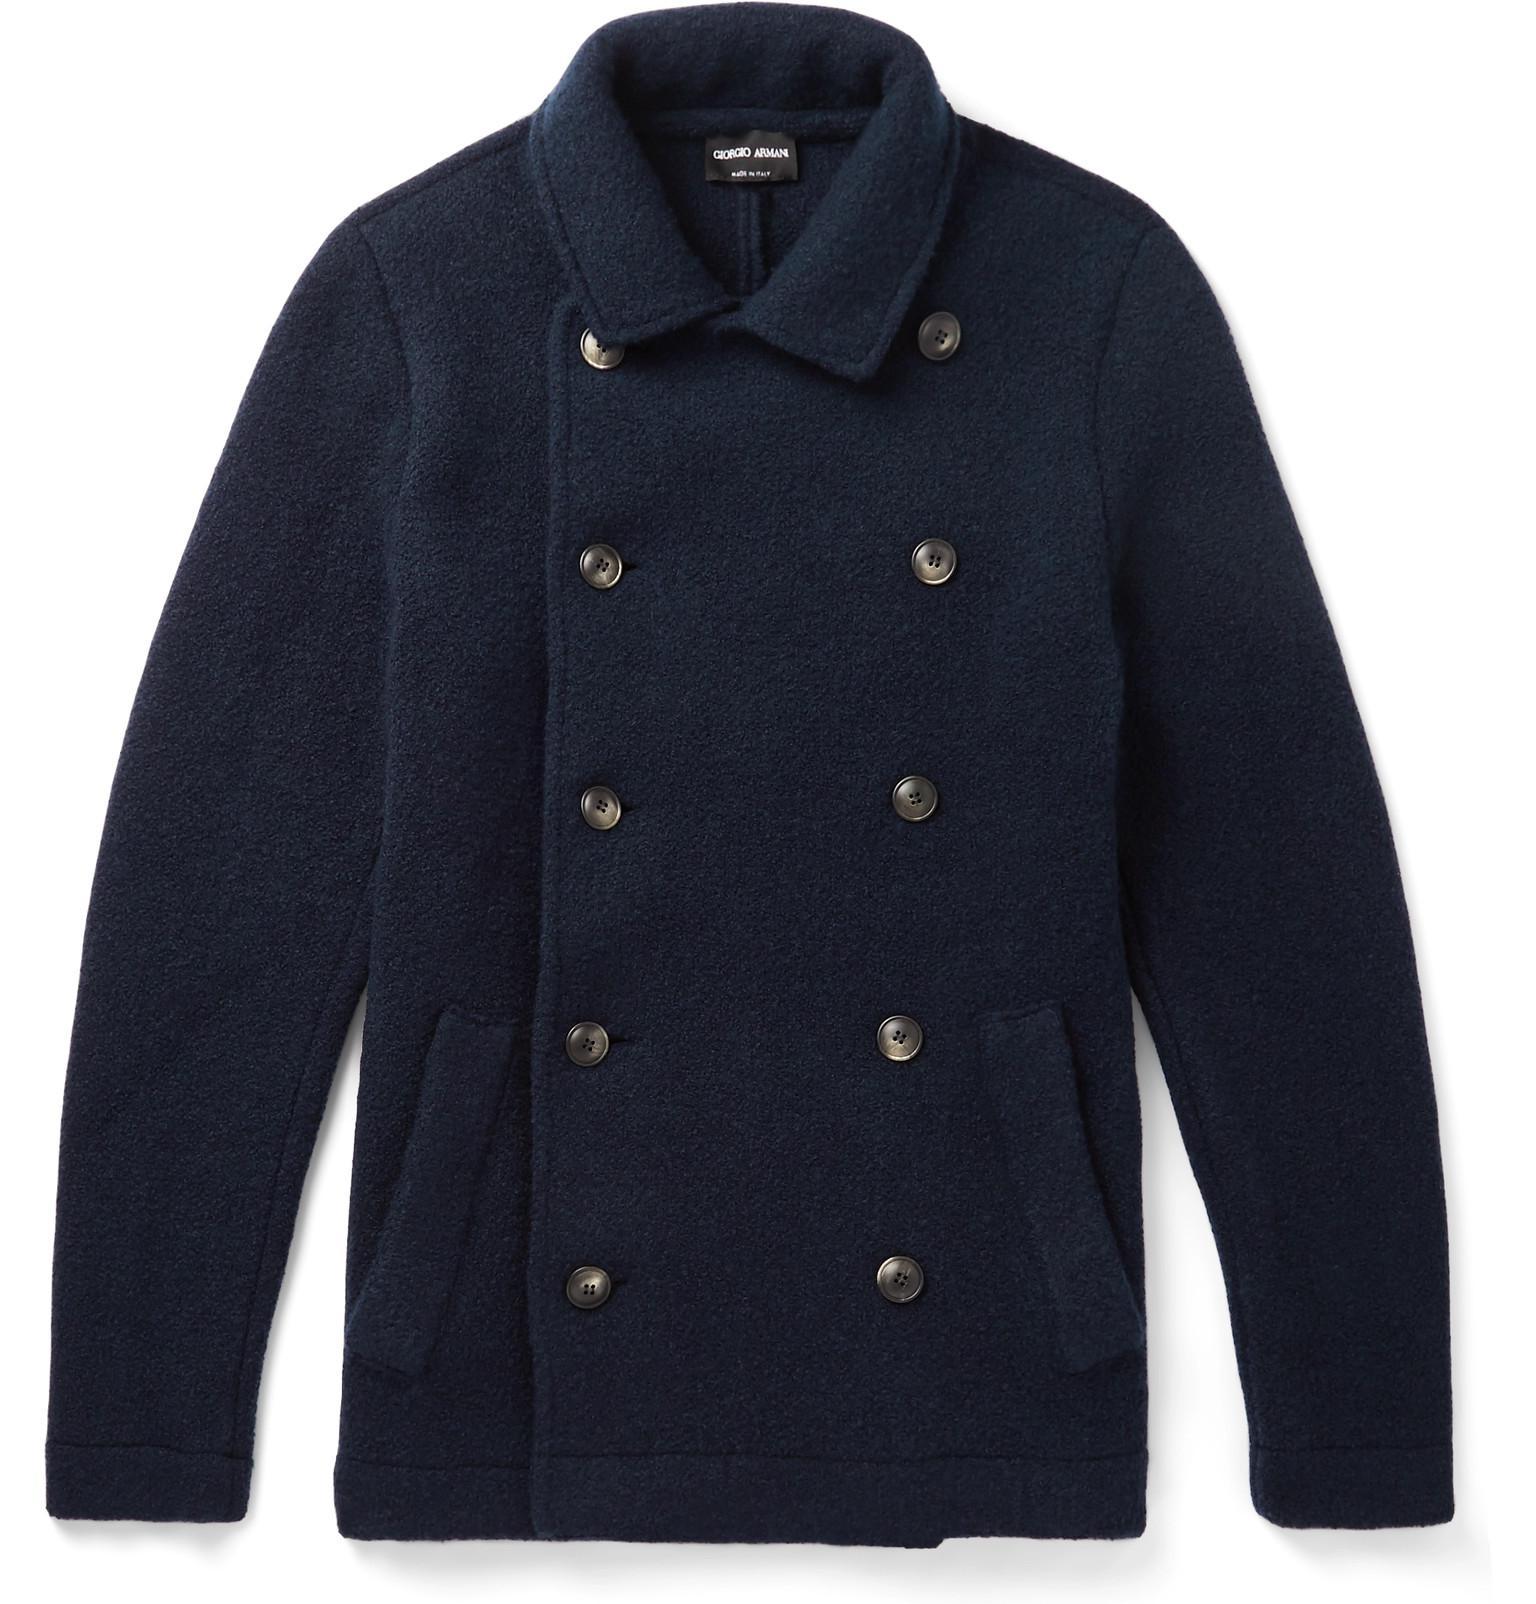 Giorgio Men's Armani Double Cashmere Slim Fit Blue Blend Coat Breasted qqFUrw5B